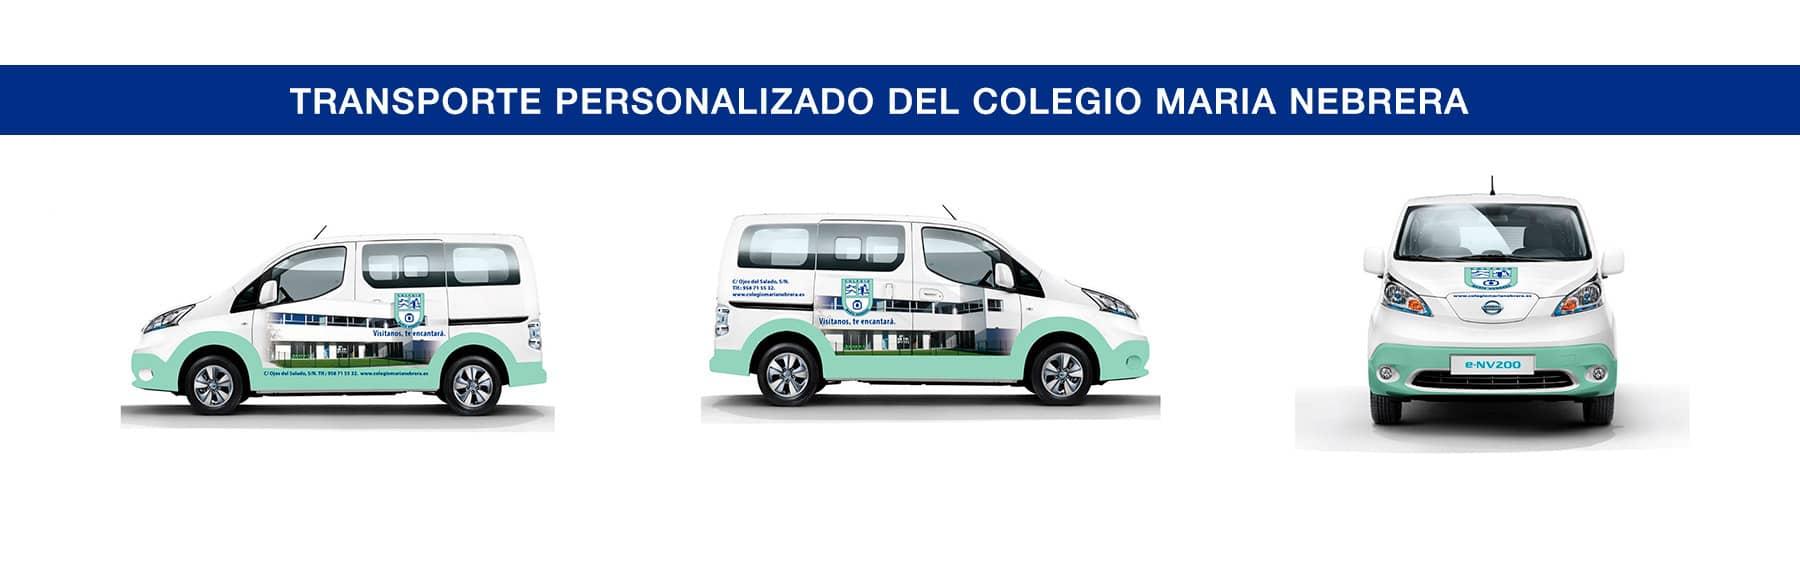 Colegio Maria Nebrera bús